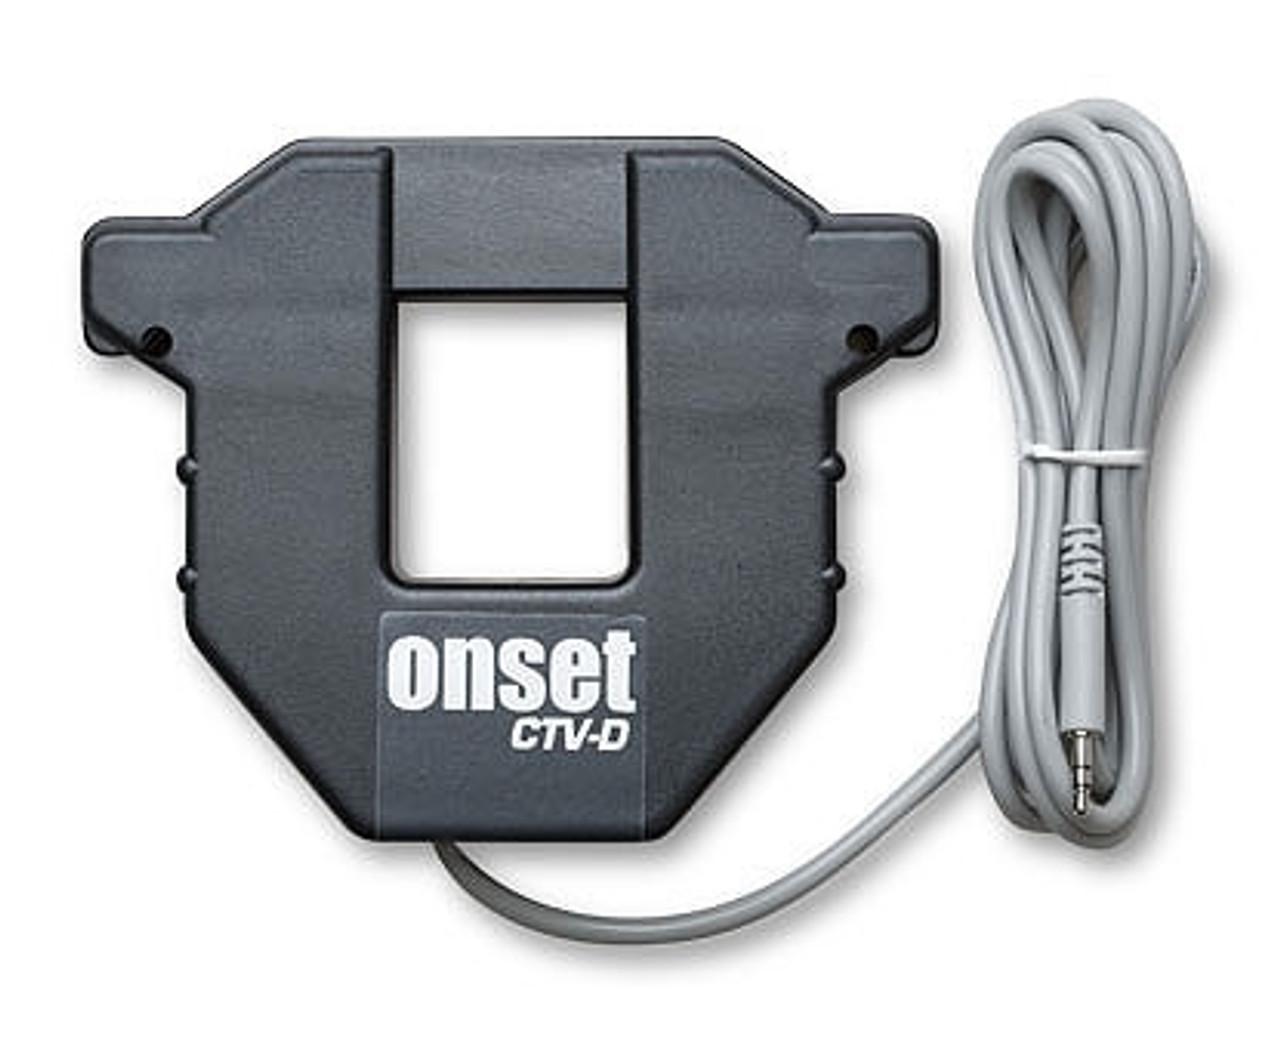 Onset Transformer, 0-200 AMP AC - CTV-D